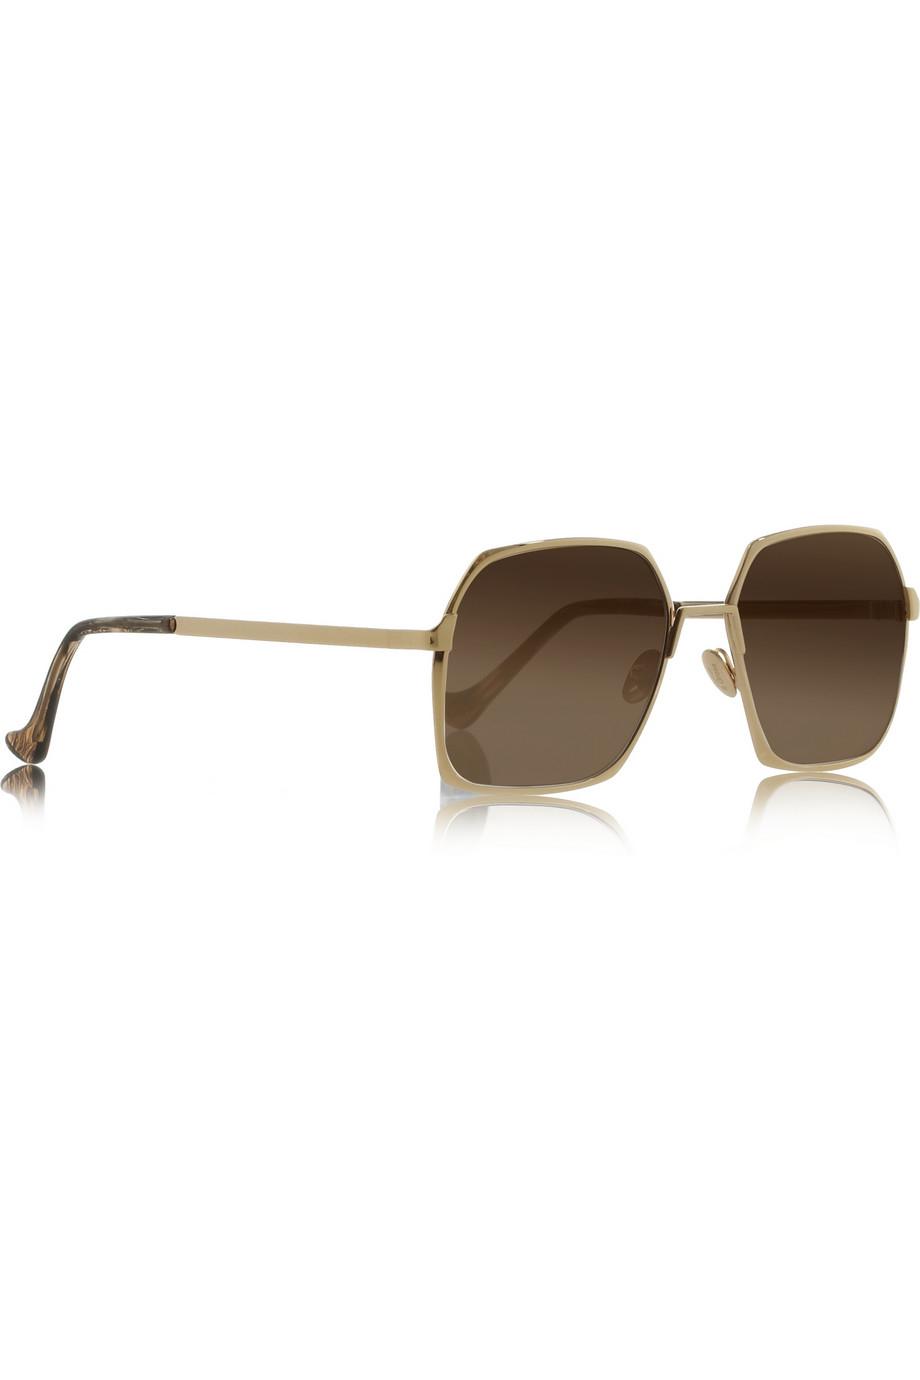 Square Gold Frame Sunglasses : Cutler & Gross Square-Frame Gold-Tone Sunglasses in Gold ...